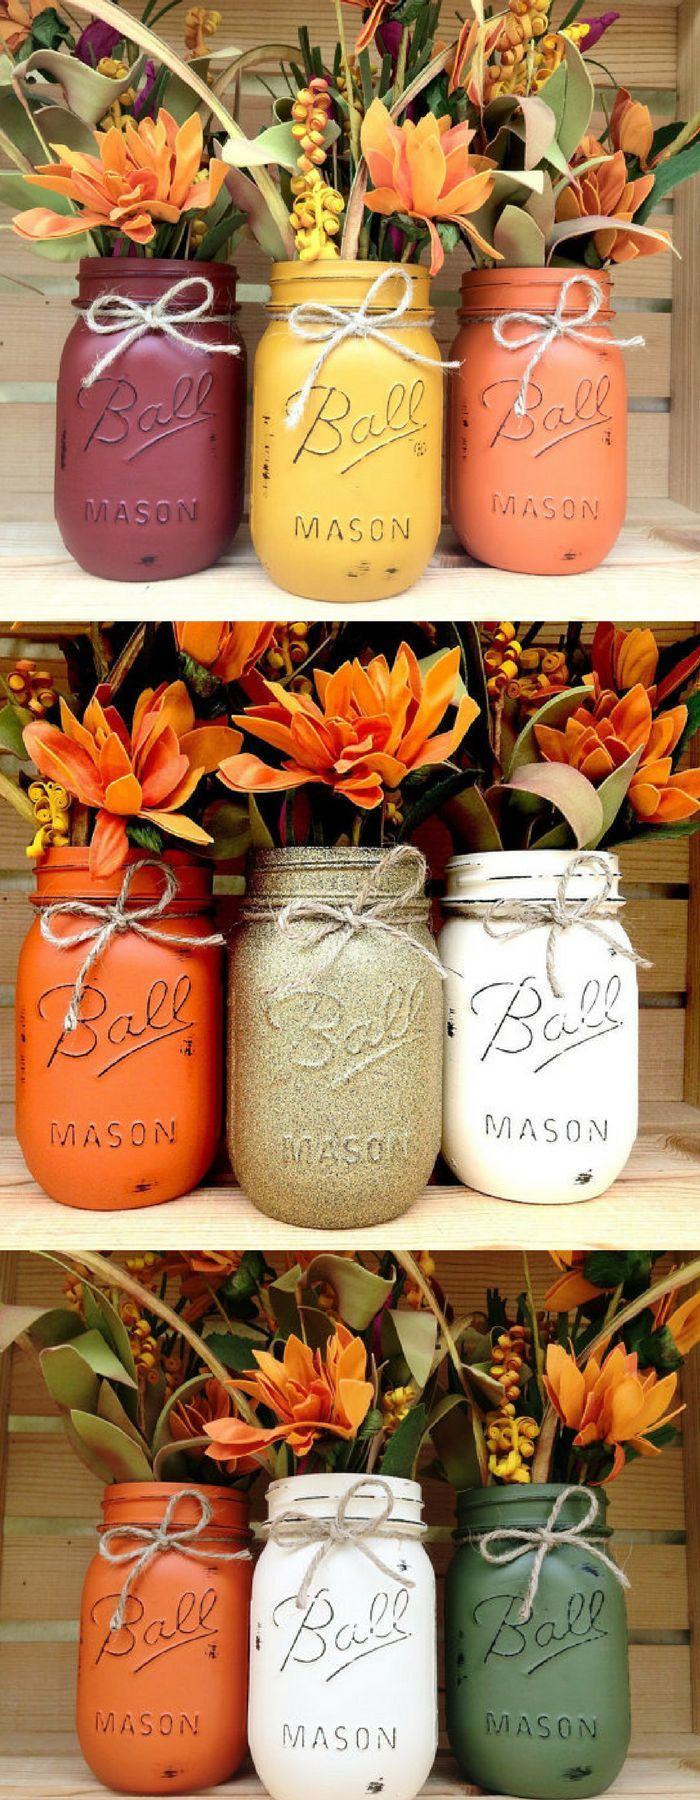 Pick 3 Mason Jar Trio   Autumn   Home Decor   Fall Decor   Thanksgiving, Centerpiece   Fall Wedding   Fall Centerpiece   Halloween Decor   Pumpkin #affiliatelink #fall #decor #masonjar #falldecorideas